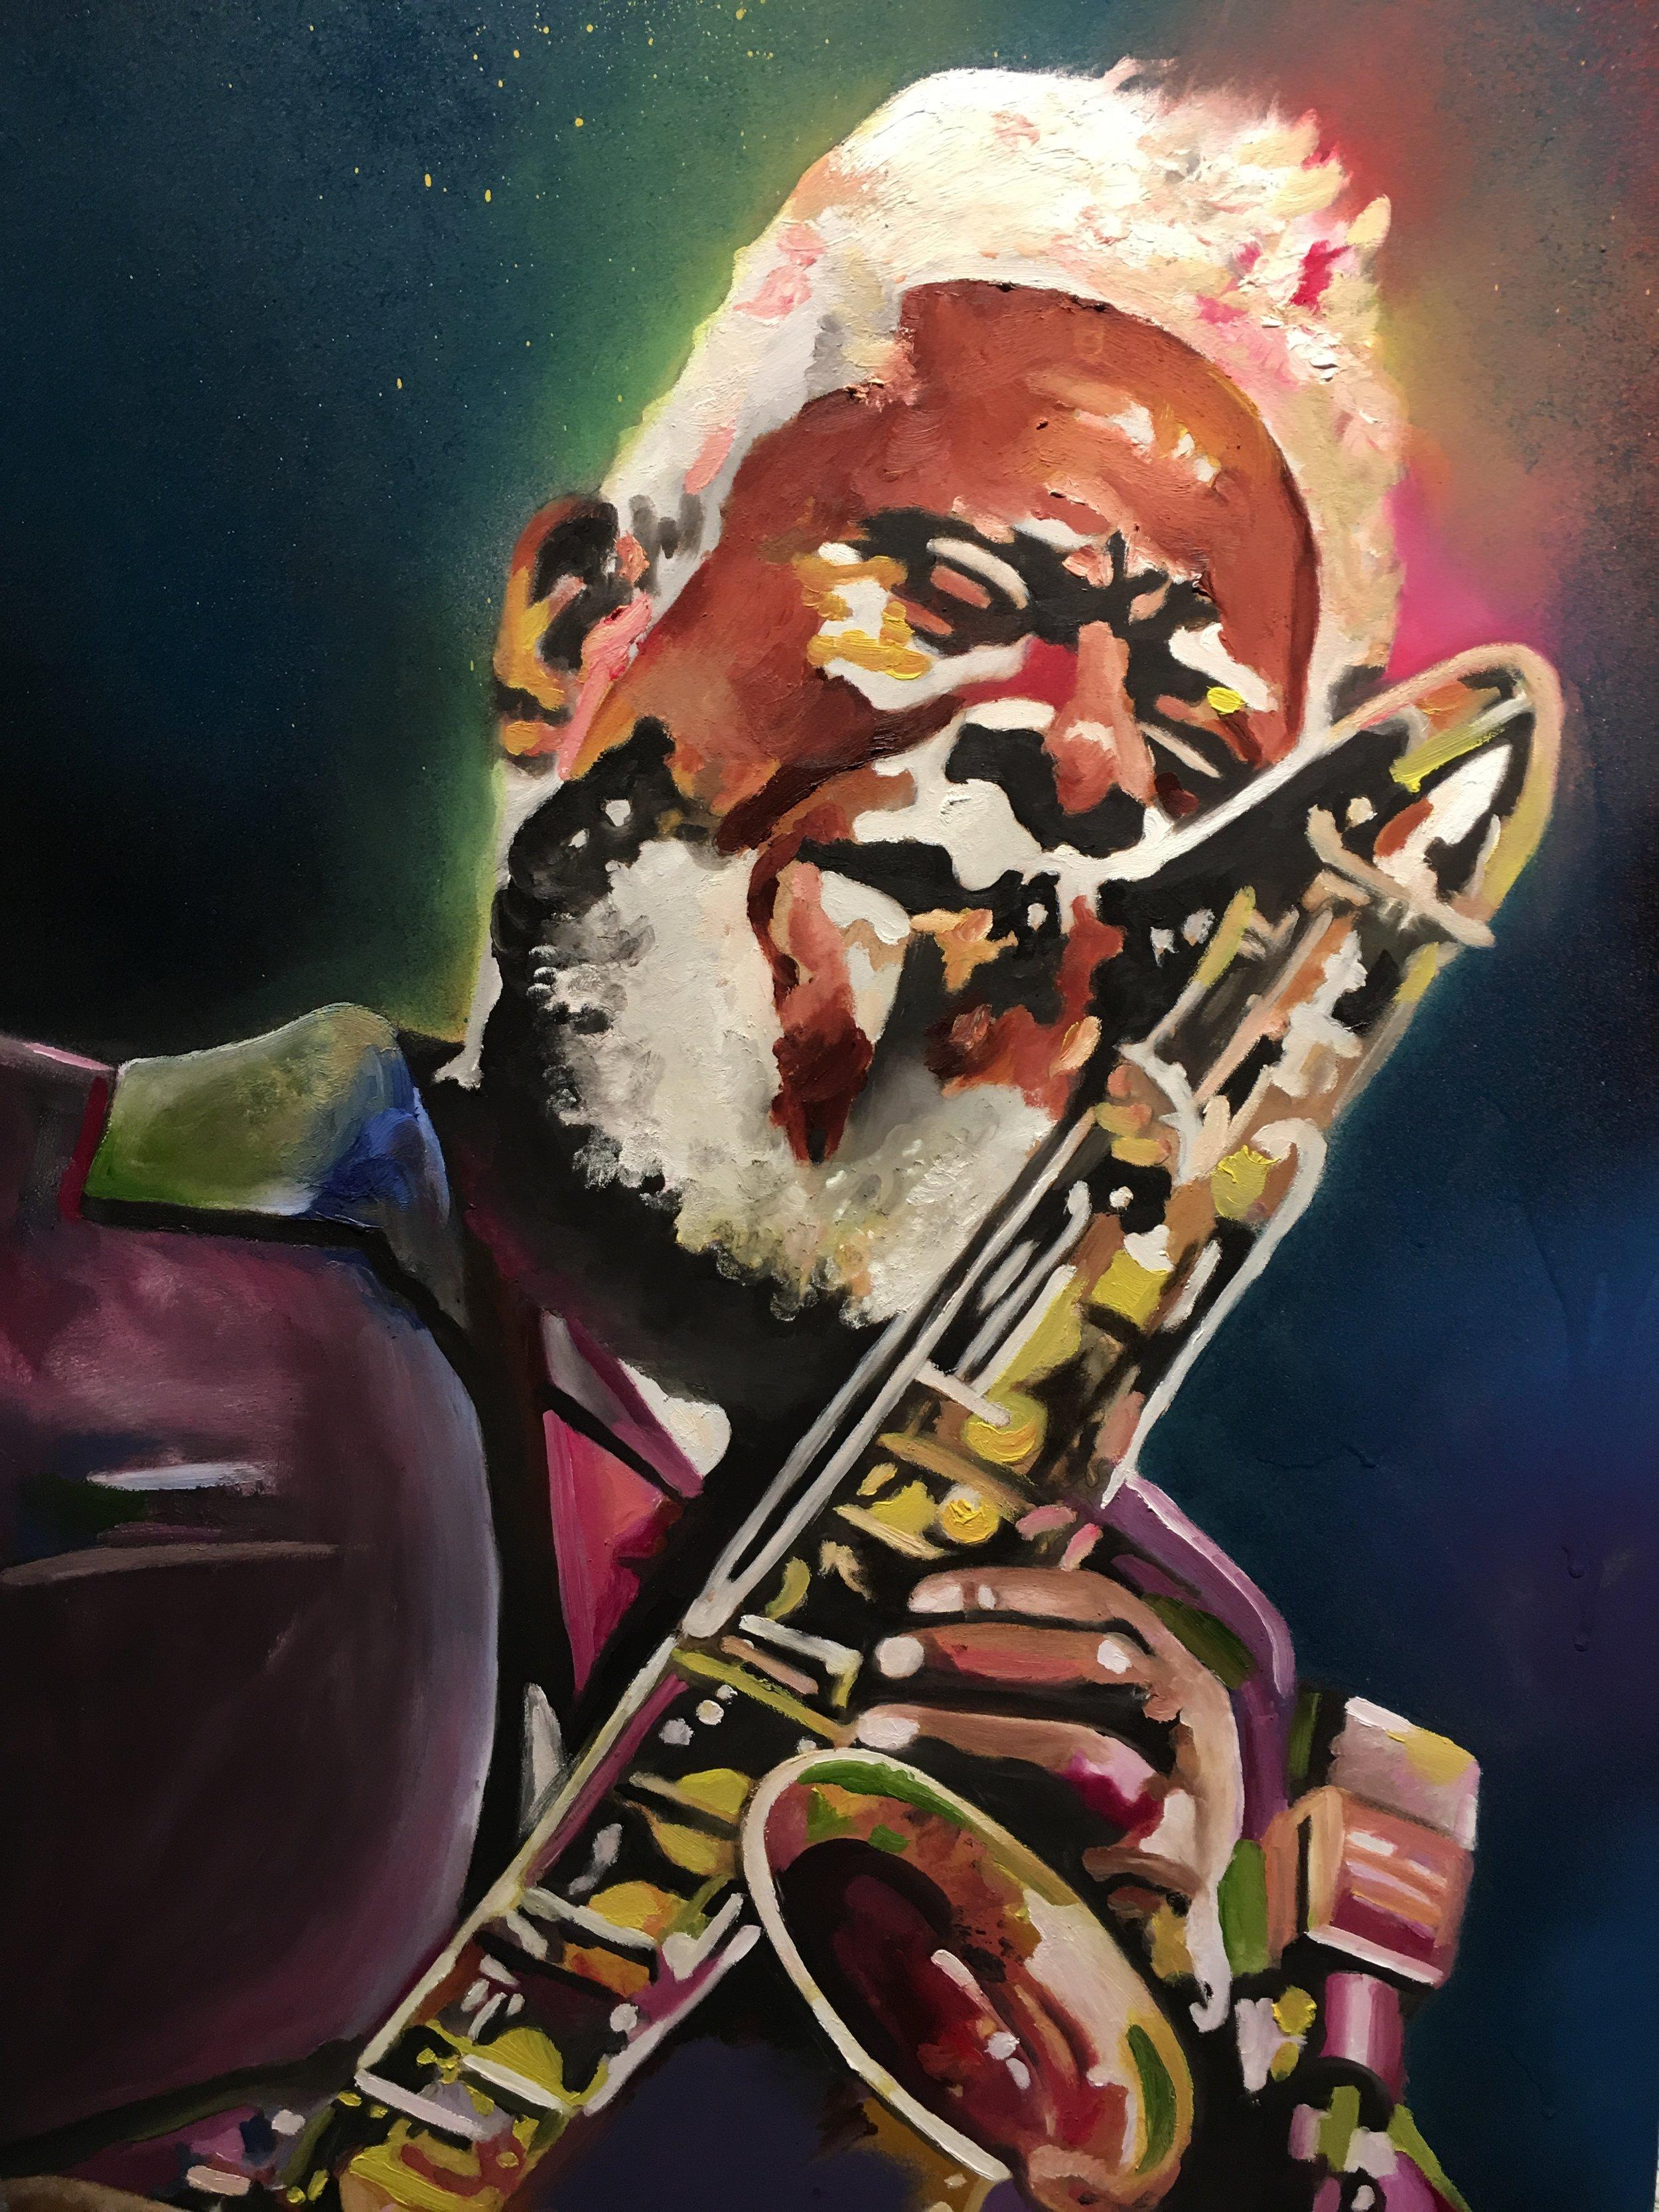 """Pharoah Sanders"" by Kacy Jackson, 48x24in, acrylic and spray paint on board"